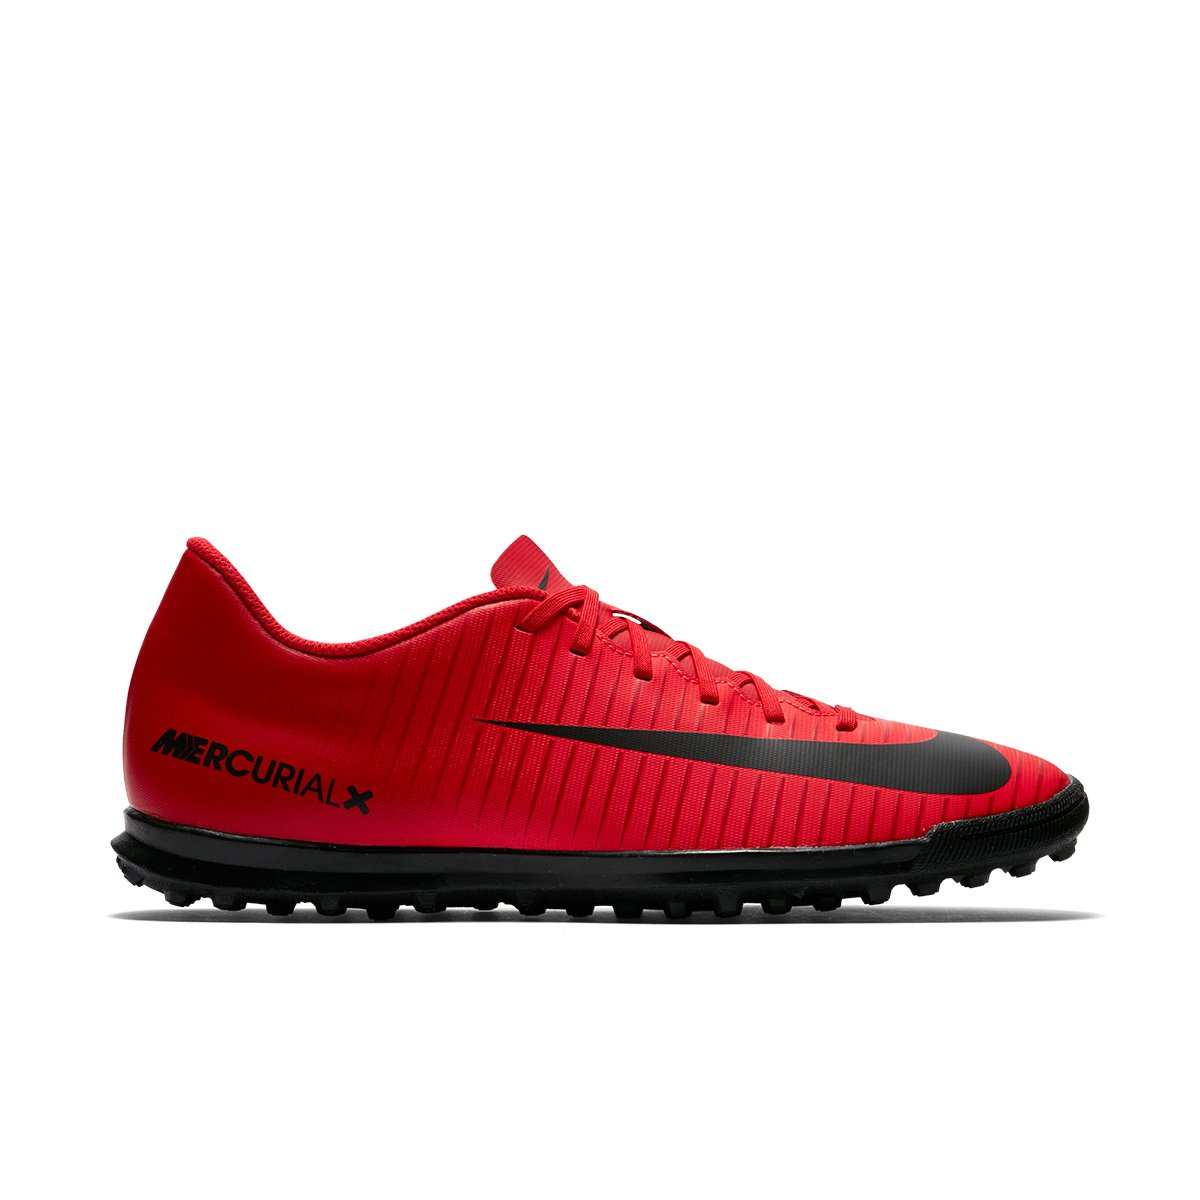 0 4 Taquets De Netshoes De Nike Free